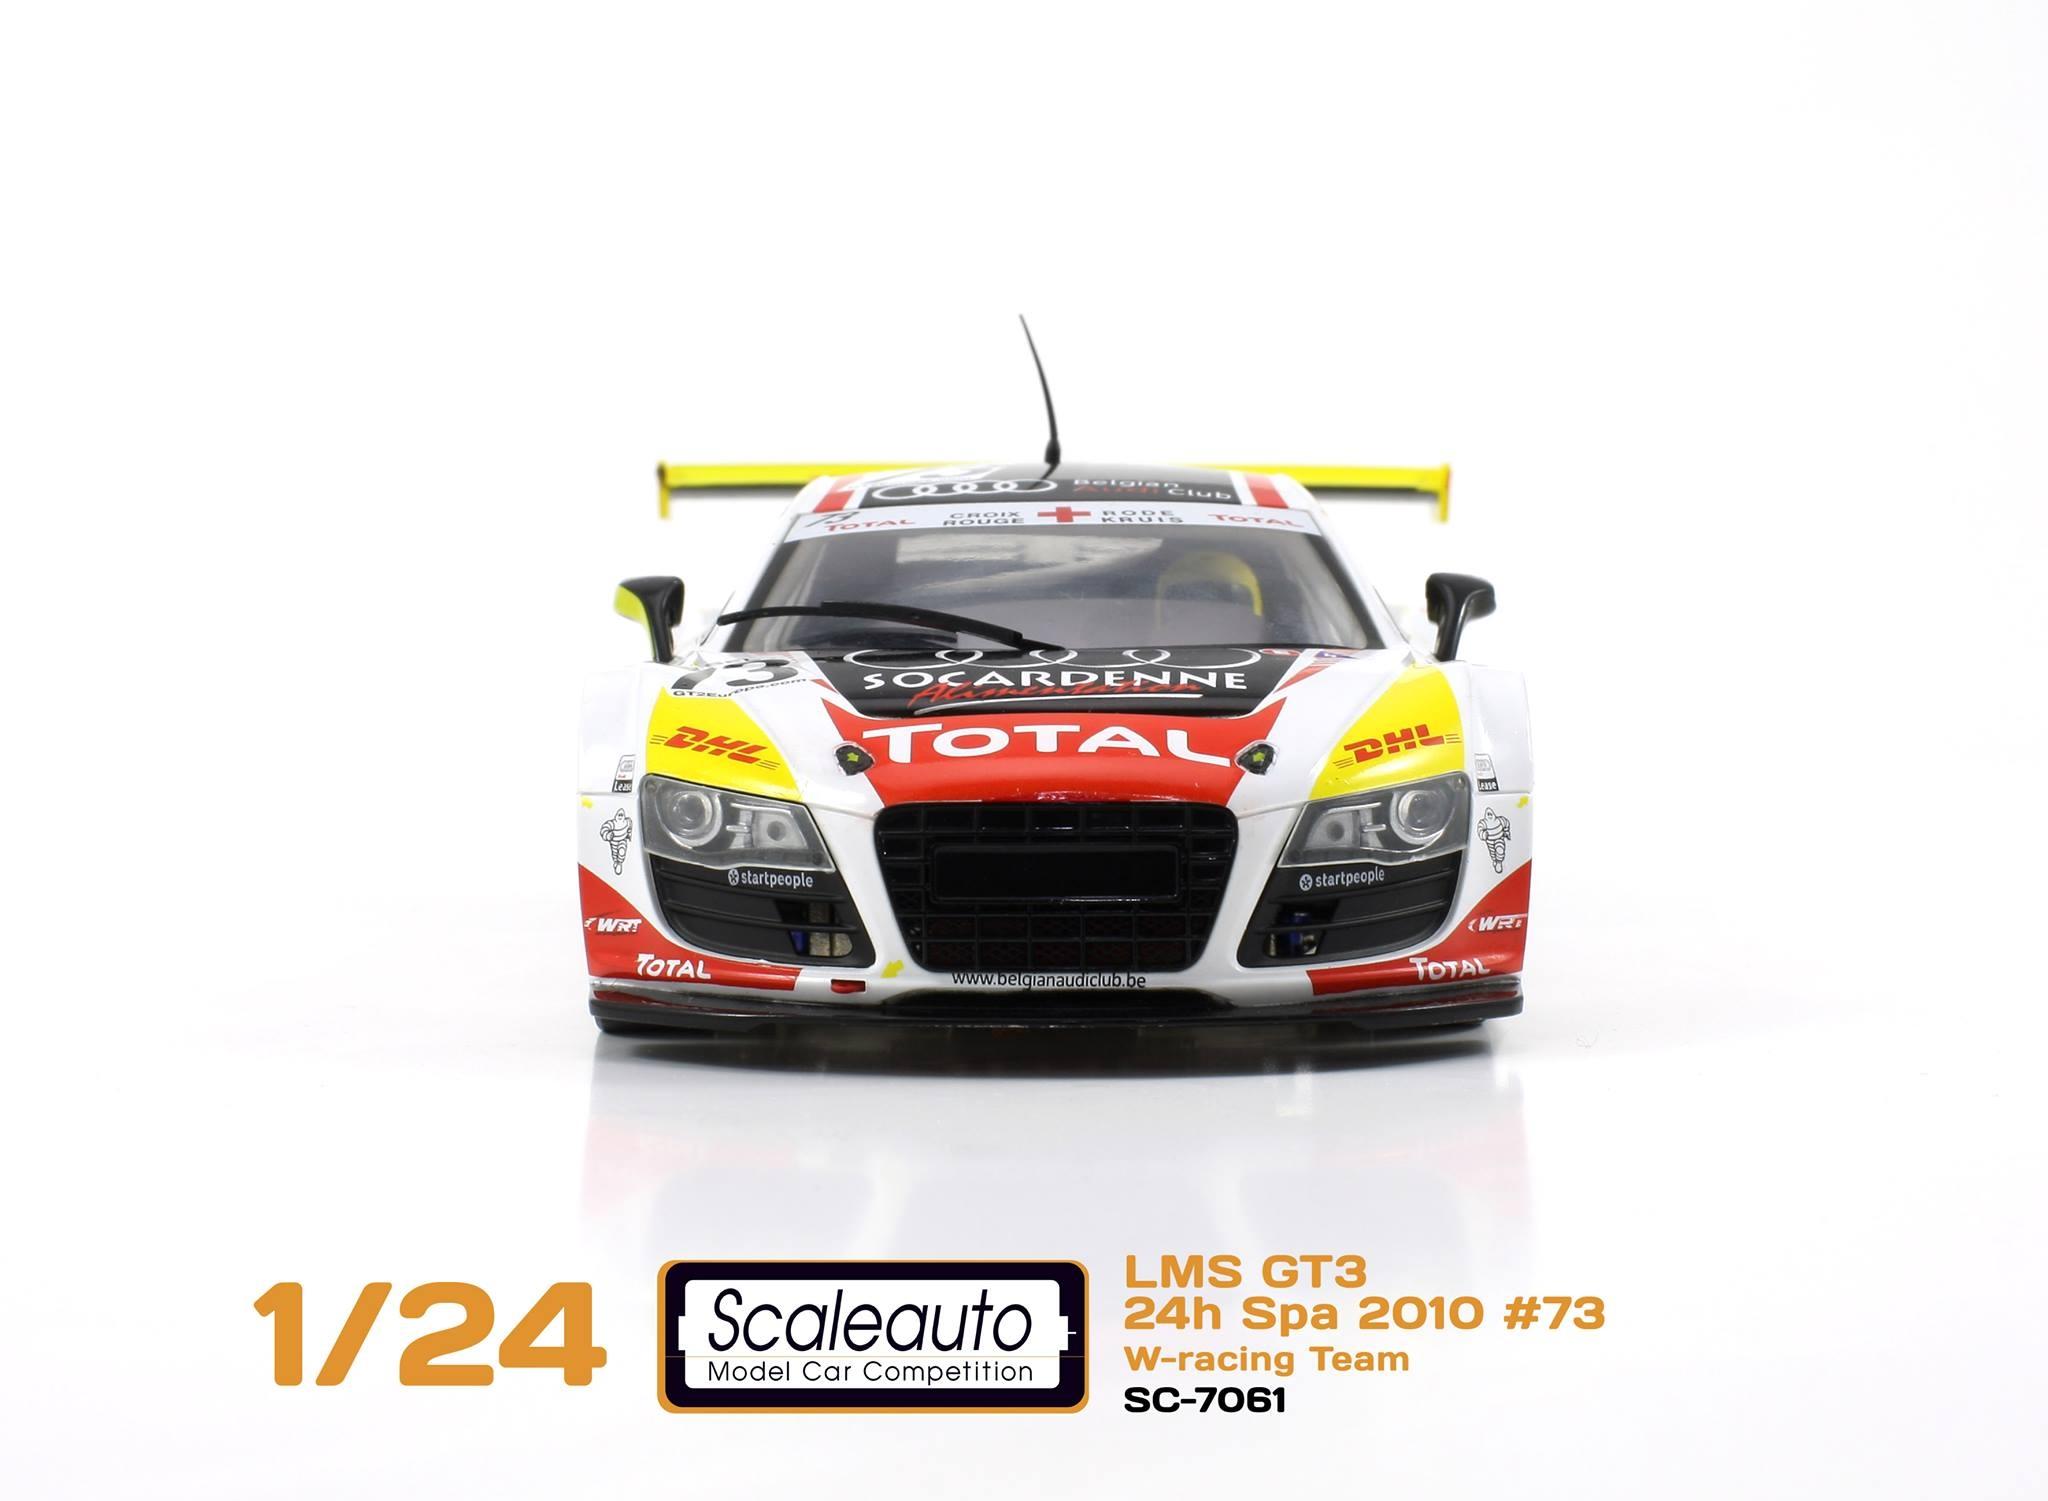 Scaleauto R8 LMS GT3 DHL